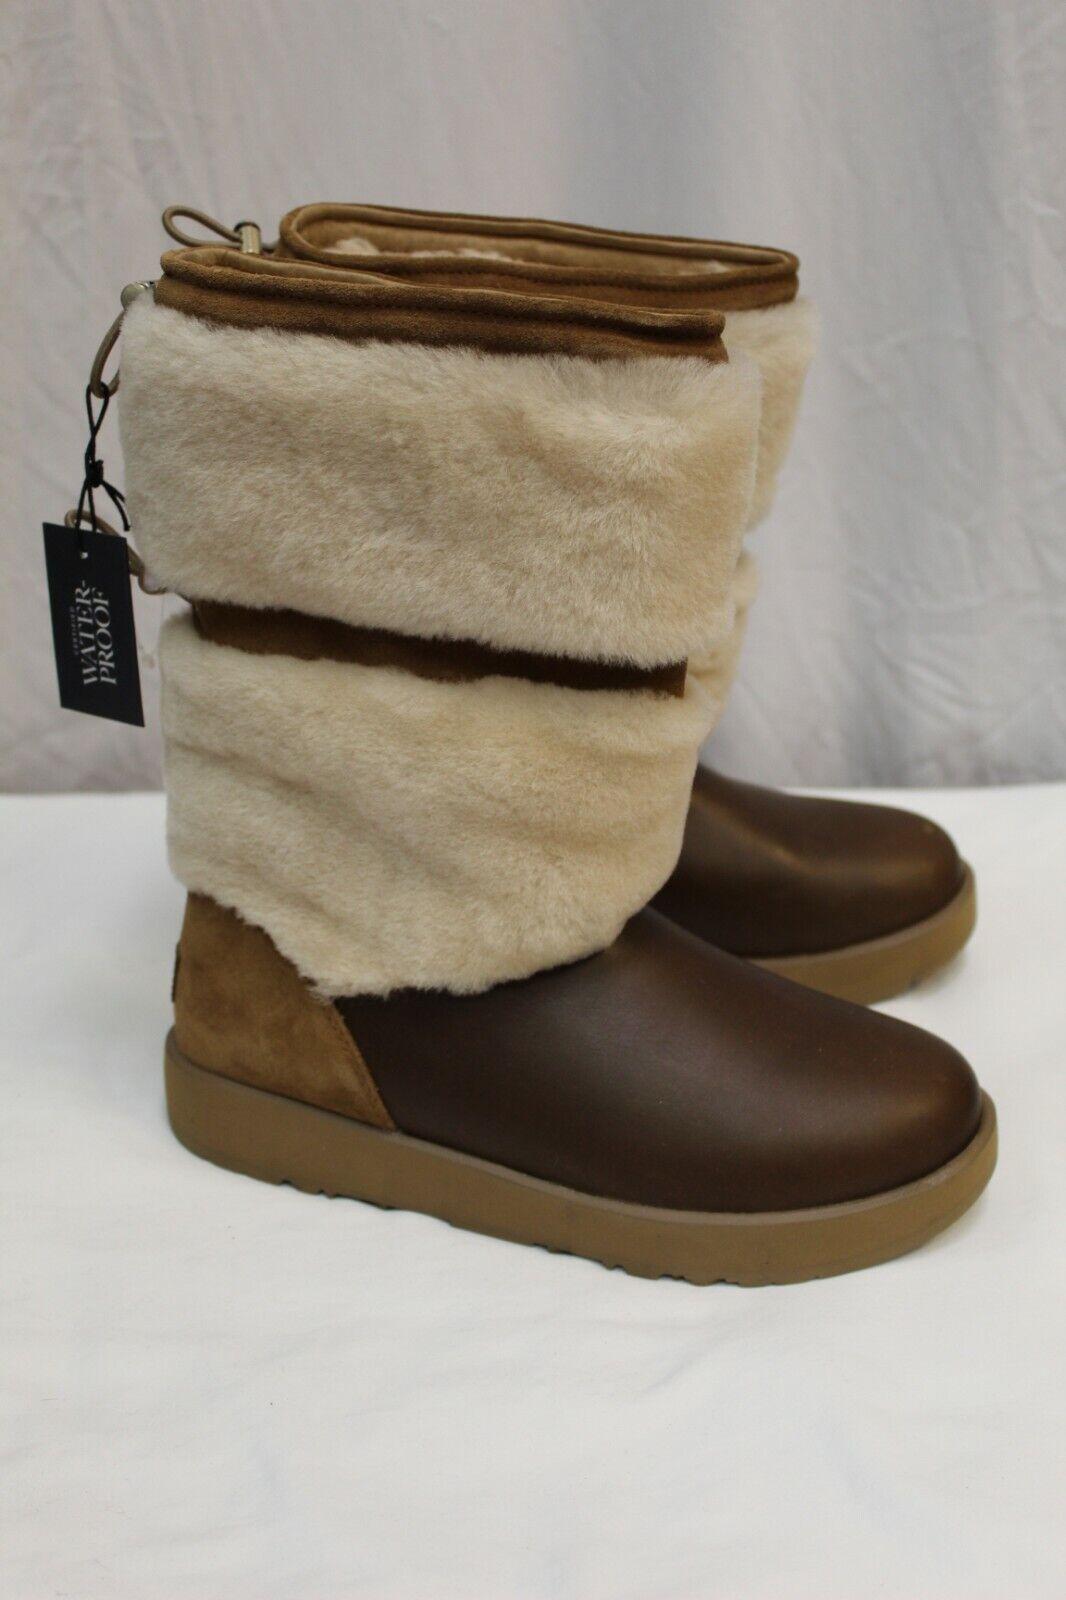 NWOB UGG Australia Waterproof Brown Shearling Lined Boots Sh